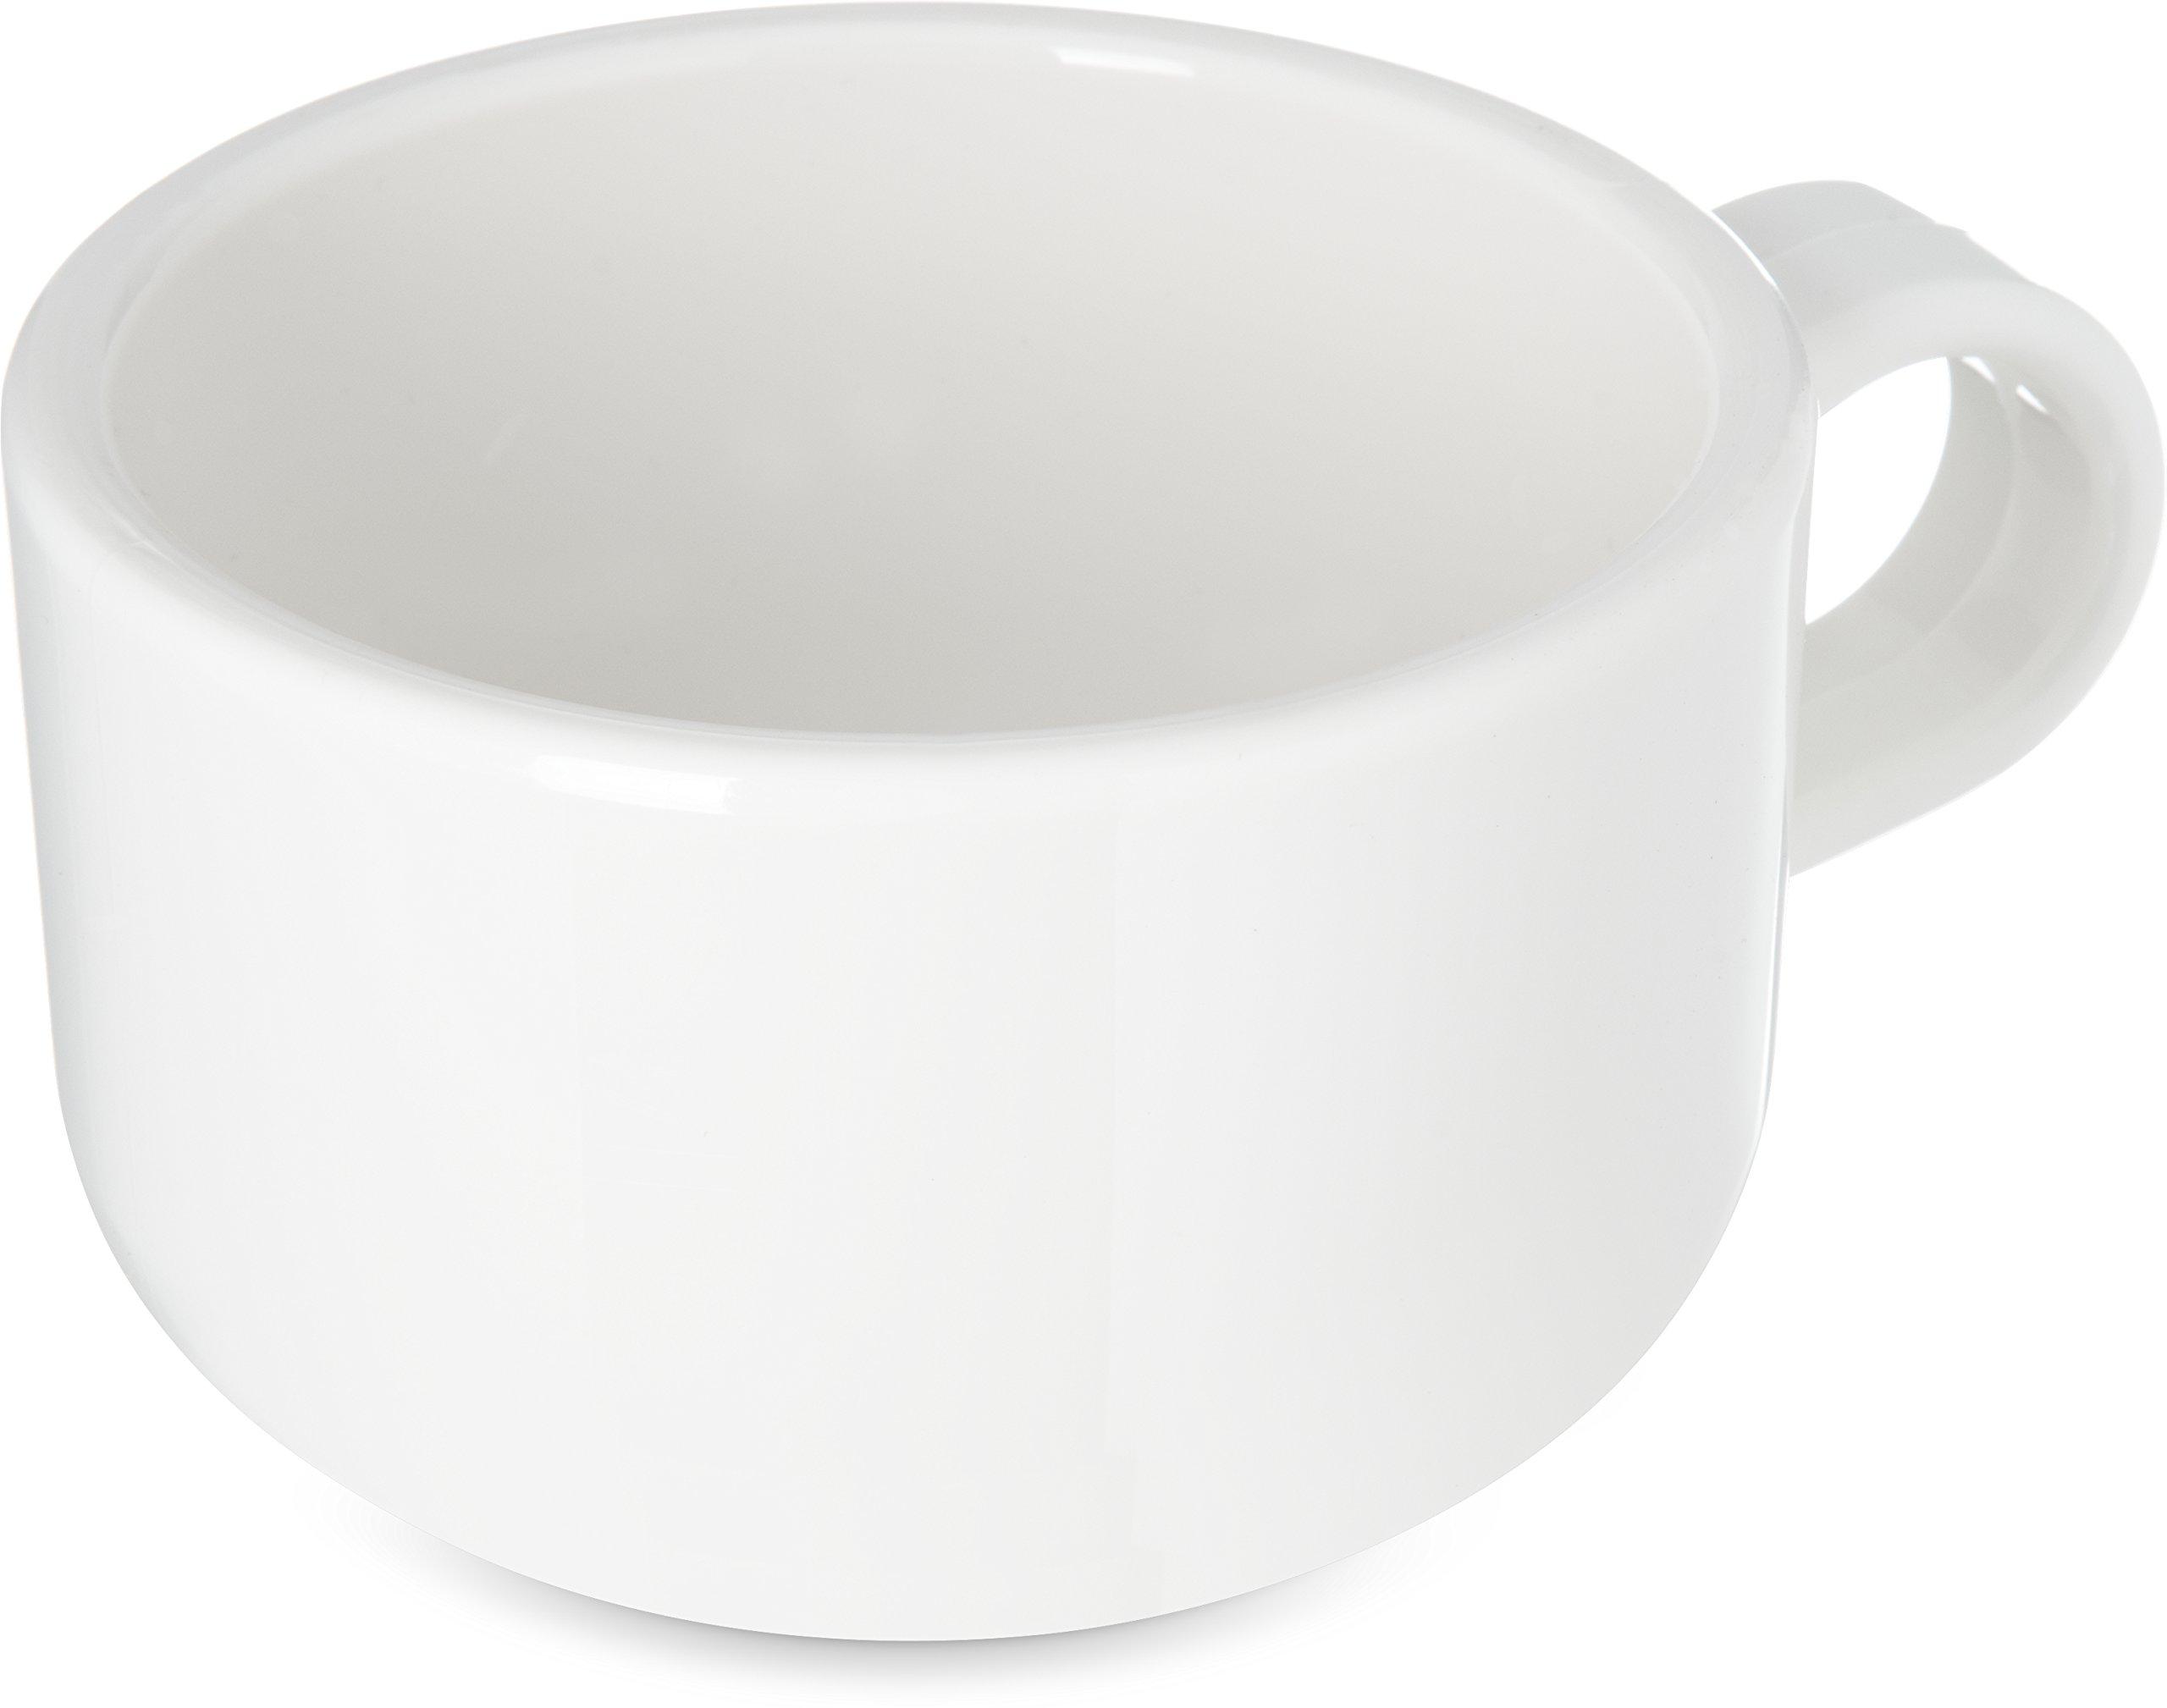 Carlisle 741002 Jumbo Soup Mug, 10 oz, 2.62'' Height, 3.93'' Width, 3.93'' Length, Polycarbonate (PC), White (Pack of 24)